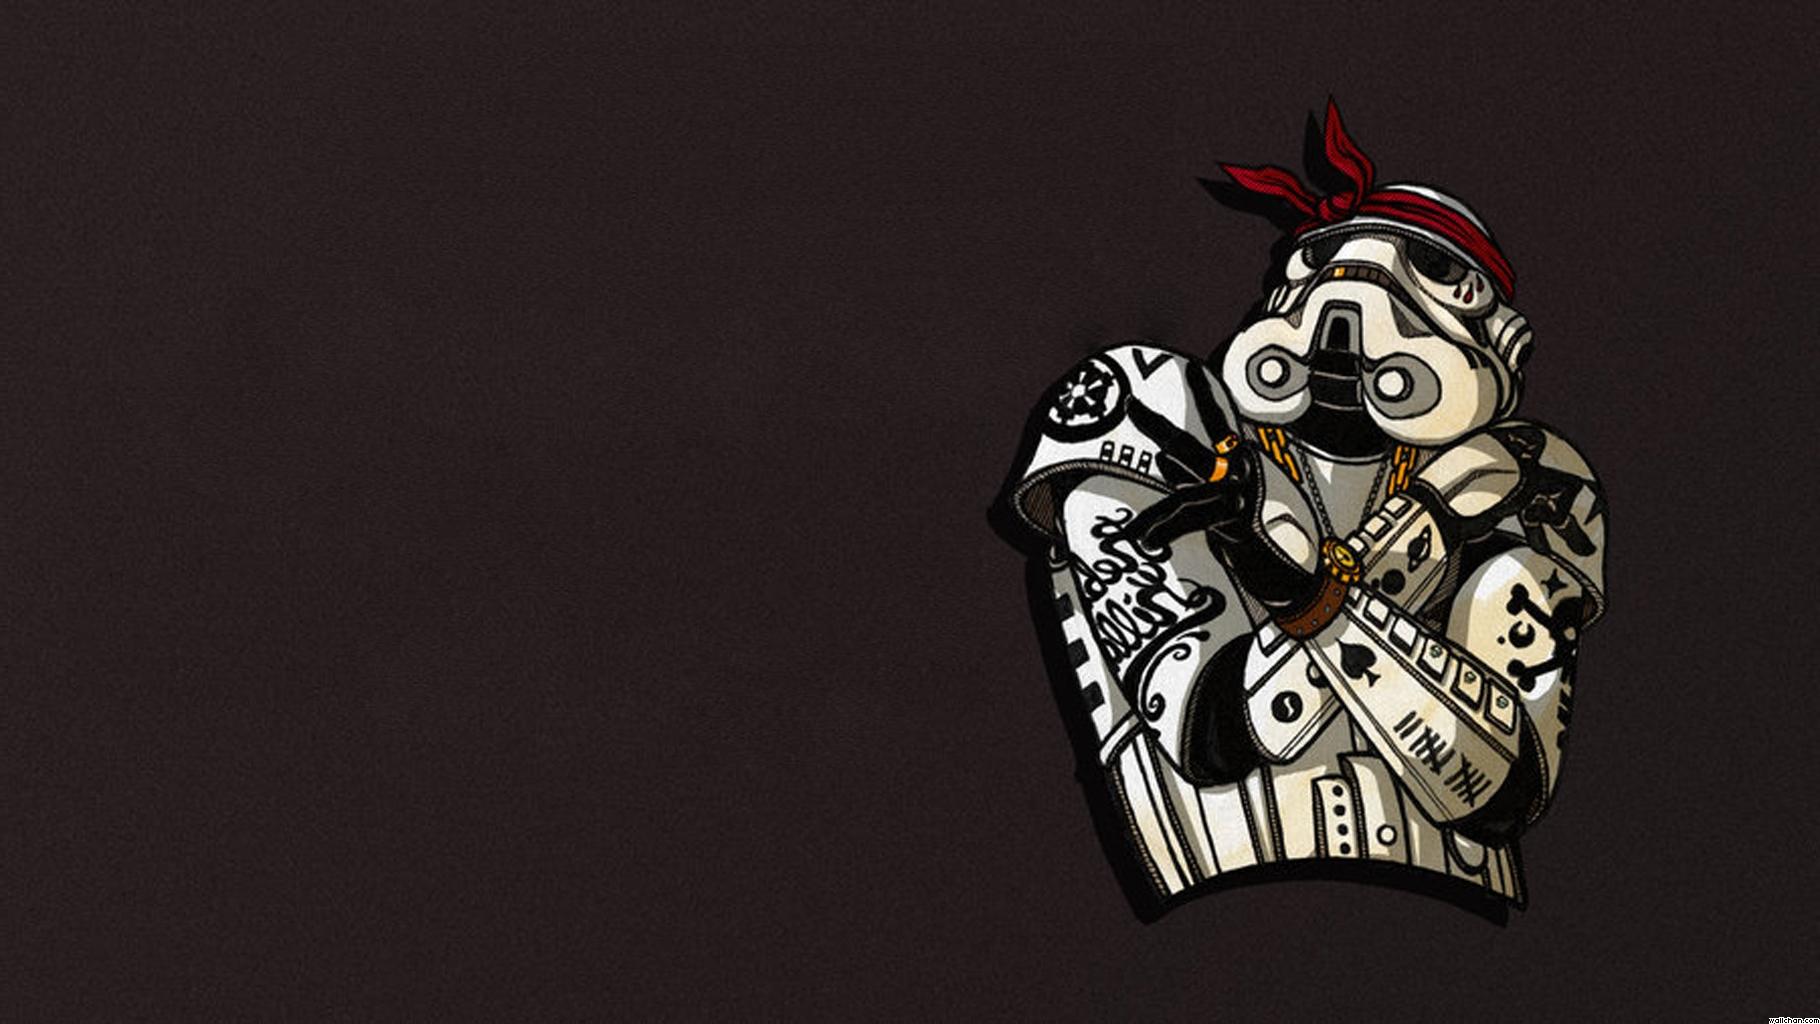 Free Download Funny Stormtrooper Wallpaper Star Wars Photo 24174475 Fanpop 1820x1024 For Your Desktop Mobile Tablet Explore 46 Star Wars Stormtrooper Desktop Wallpaper First Order Stormtrooper Wallpaper Stormtrooper Wallpaper